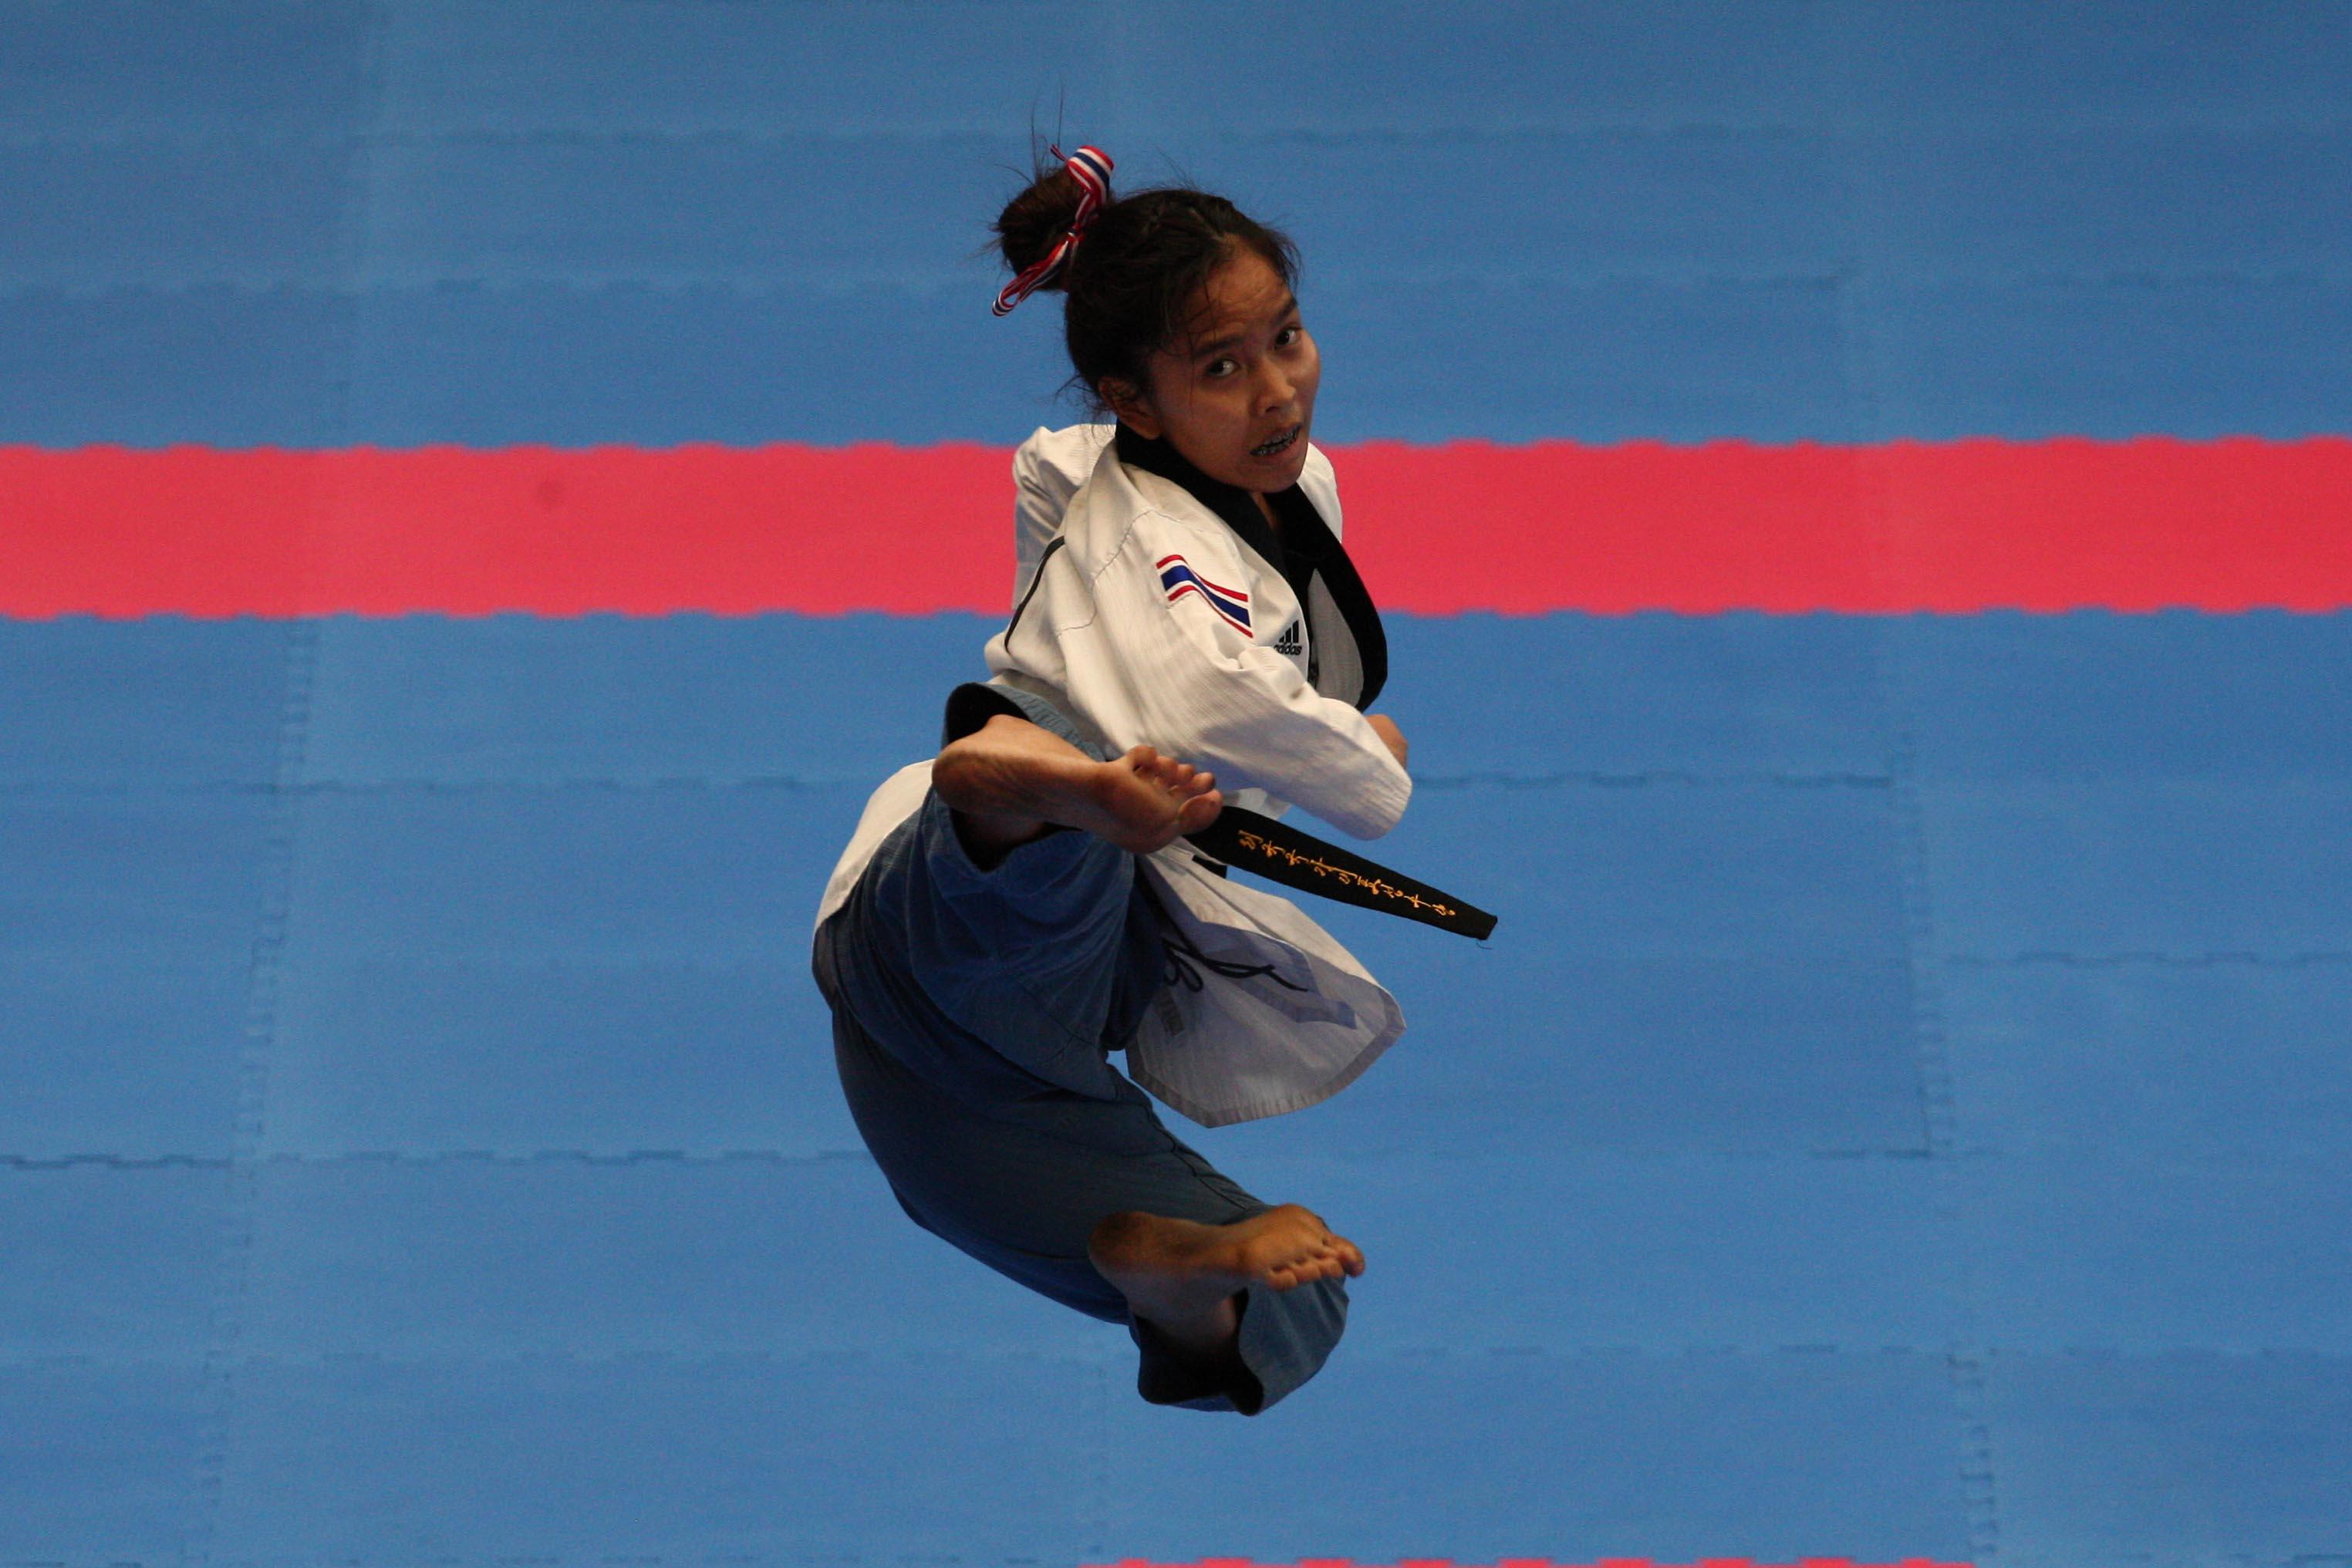 Pala Casoria finali di Taekwondo Laousungnoen Sakuna Thailandia , Napoli 7 Luglio 2019 Photo pool fotografi Universiadi